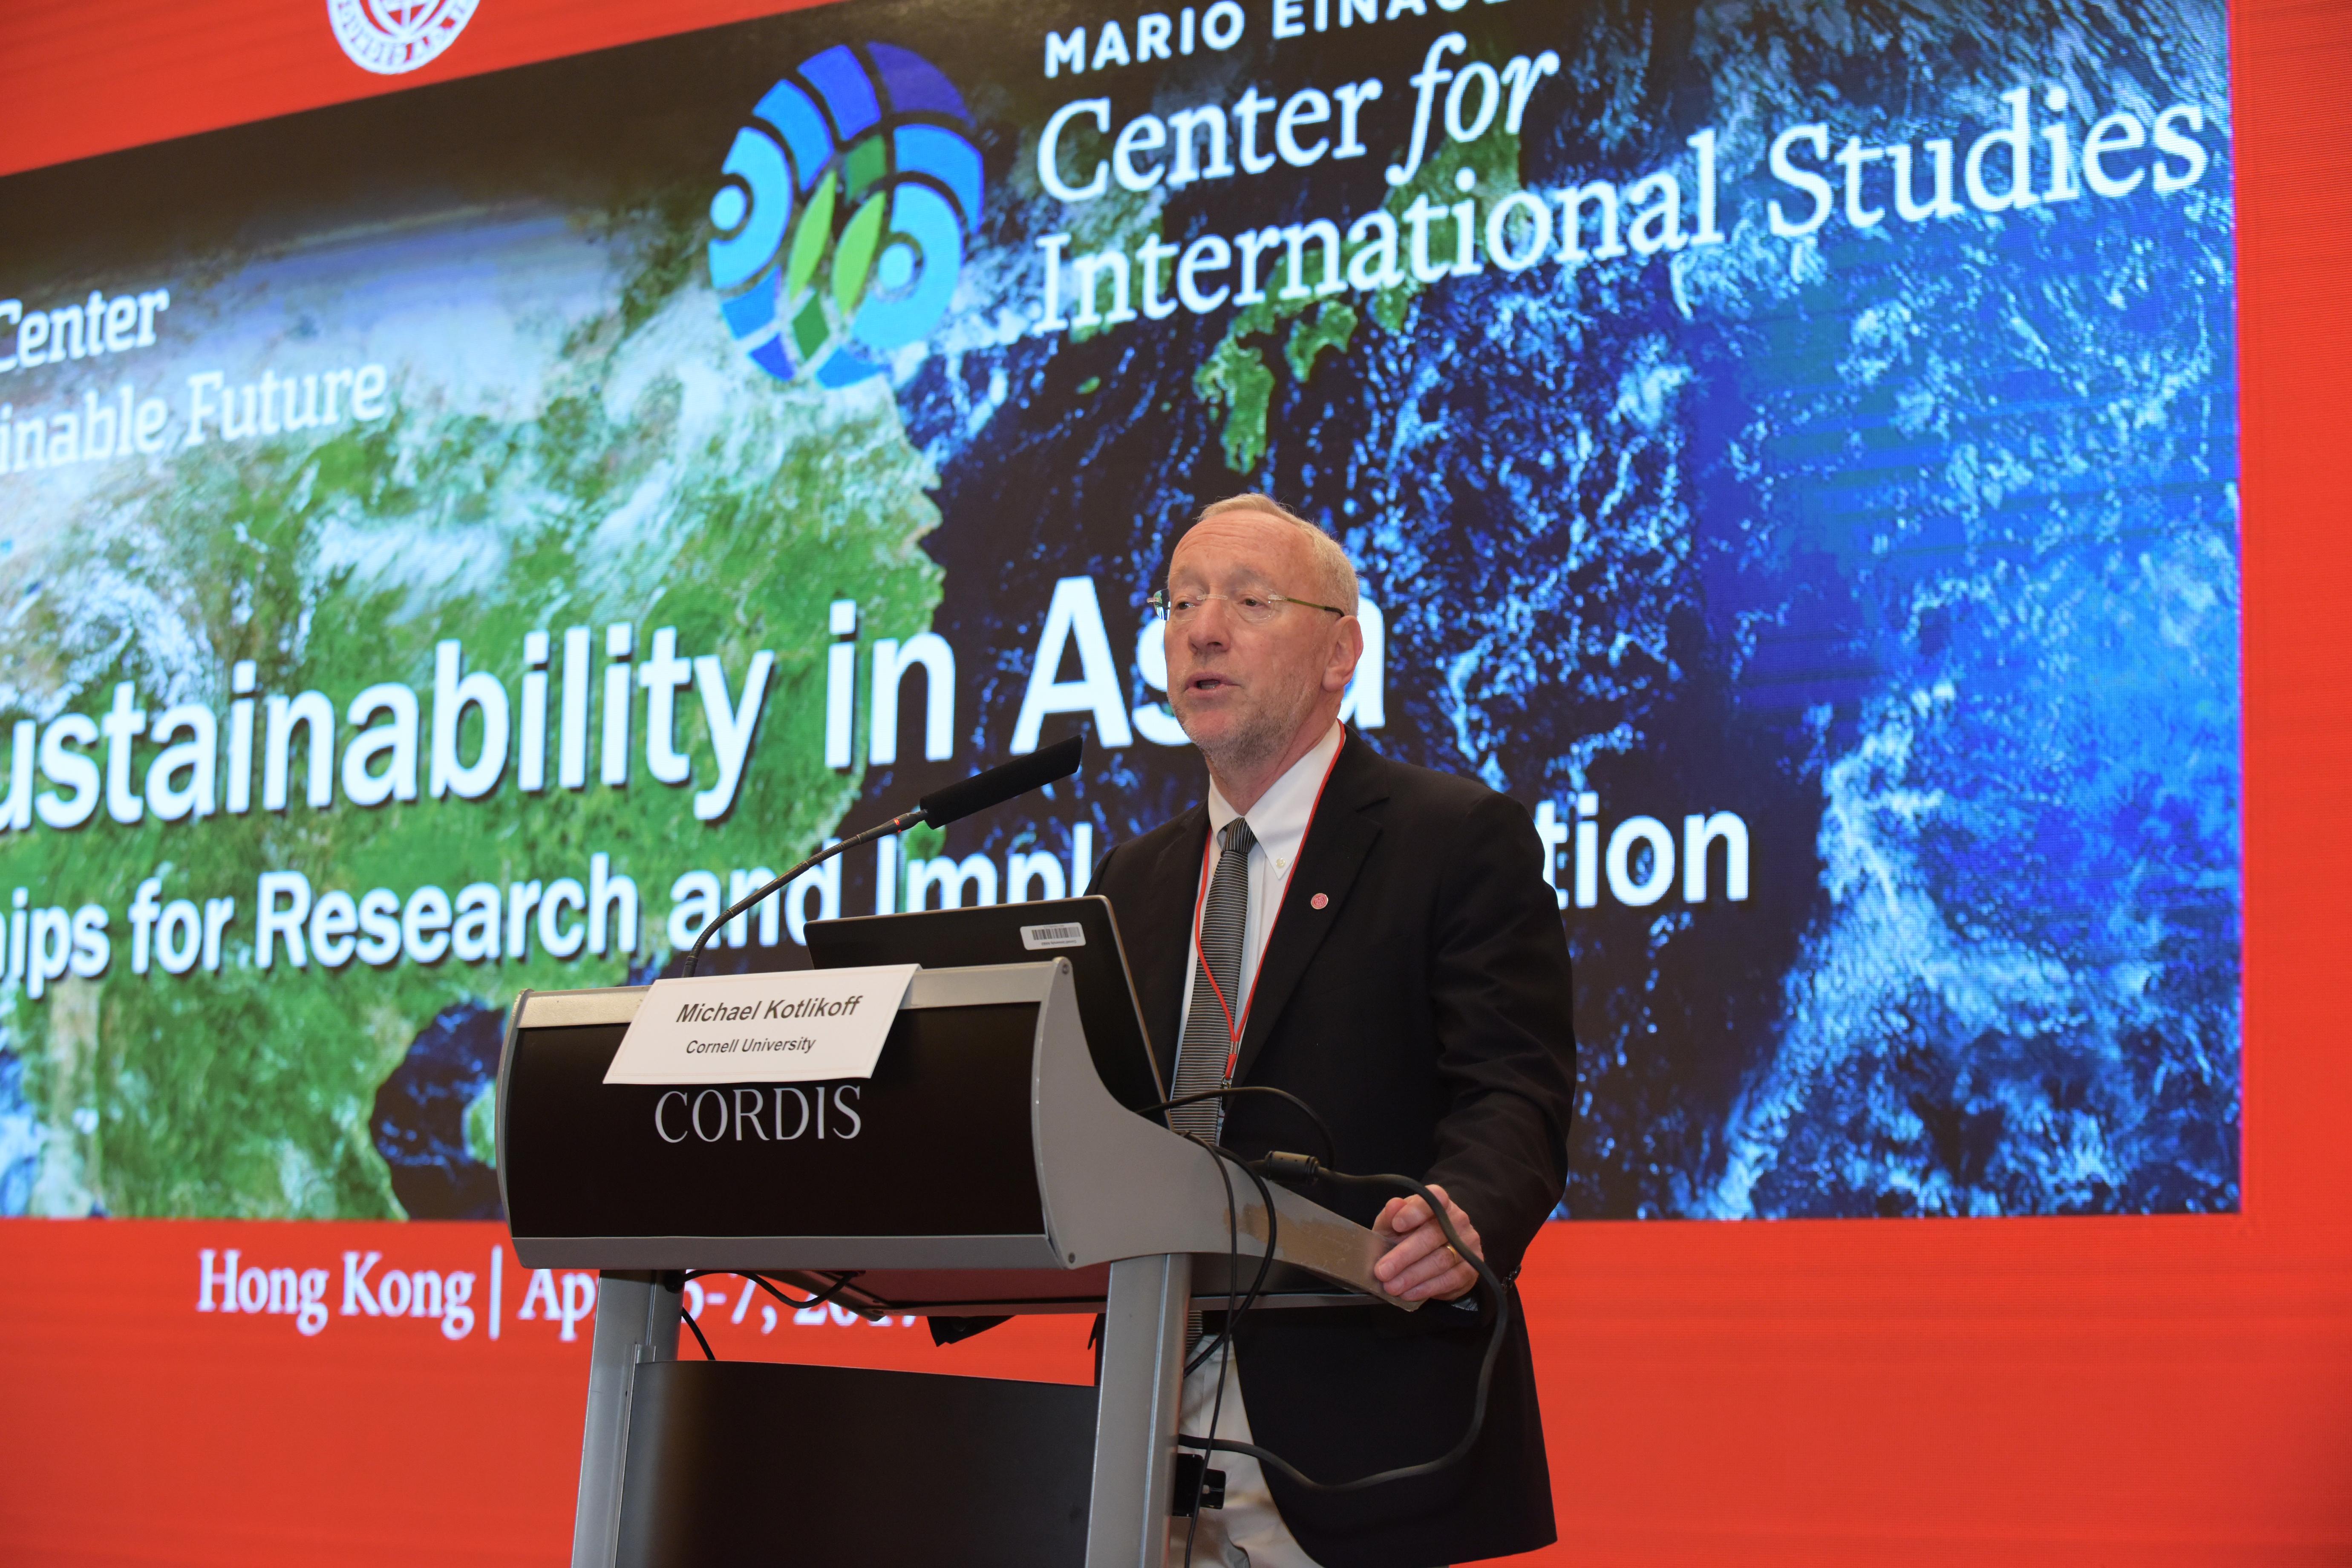 Cornell Provost Michael Kotlikoff